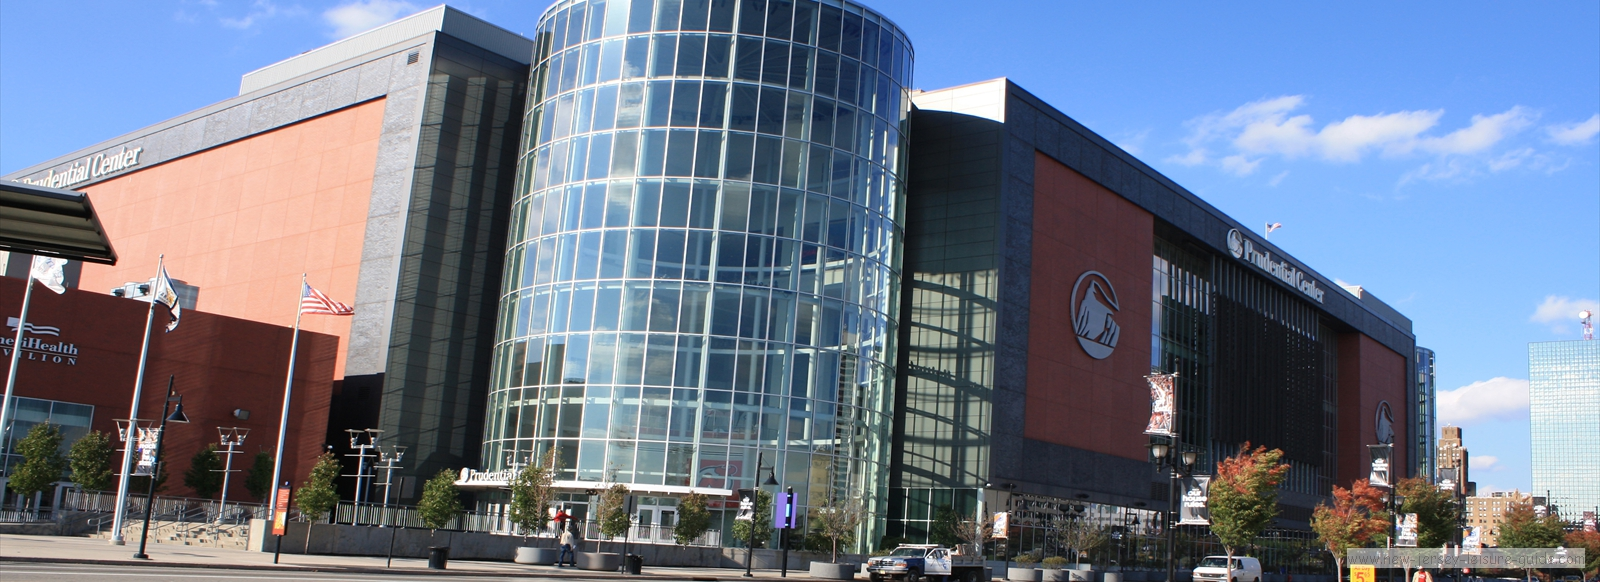 Prudential Center Newark Hotels